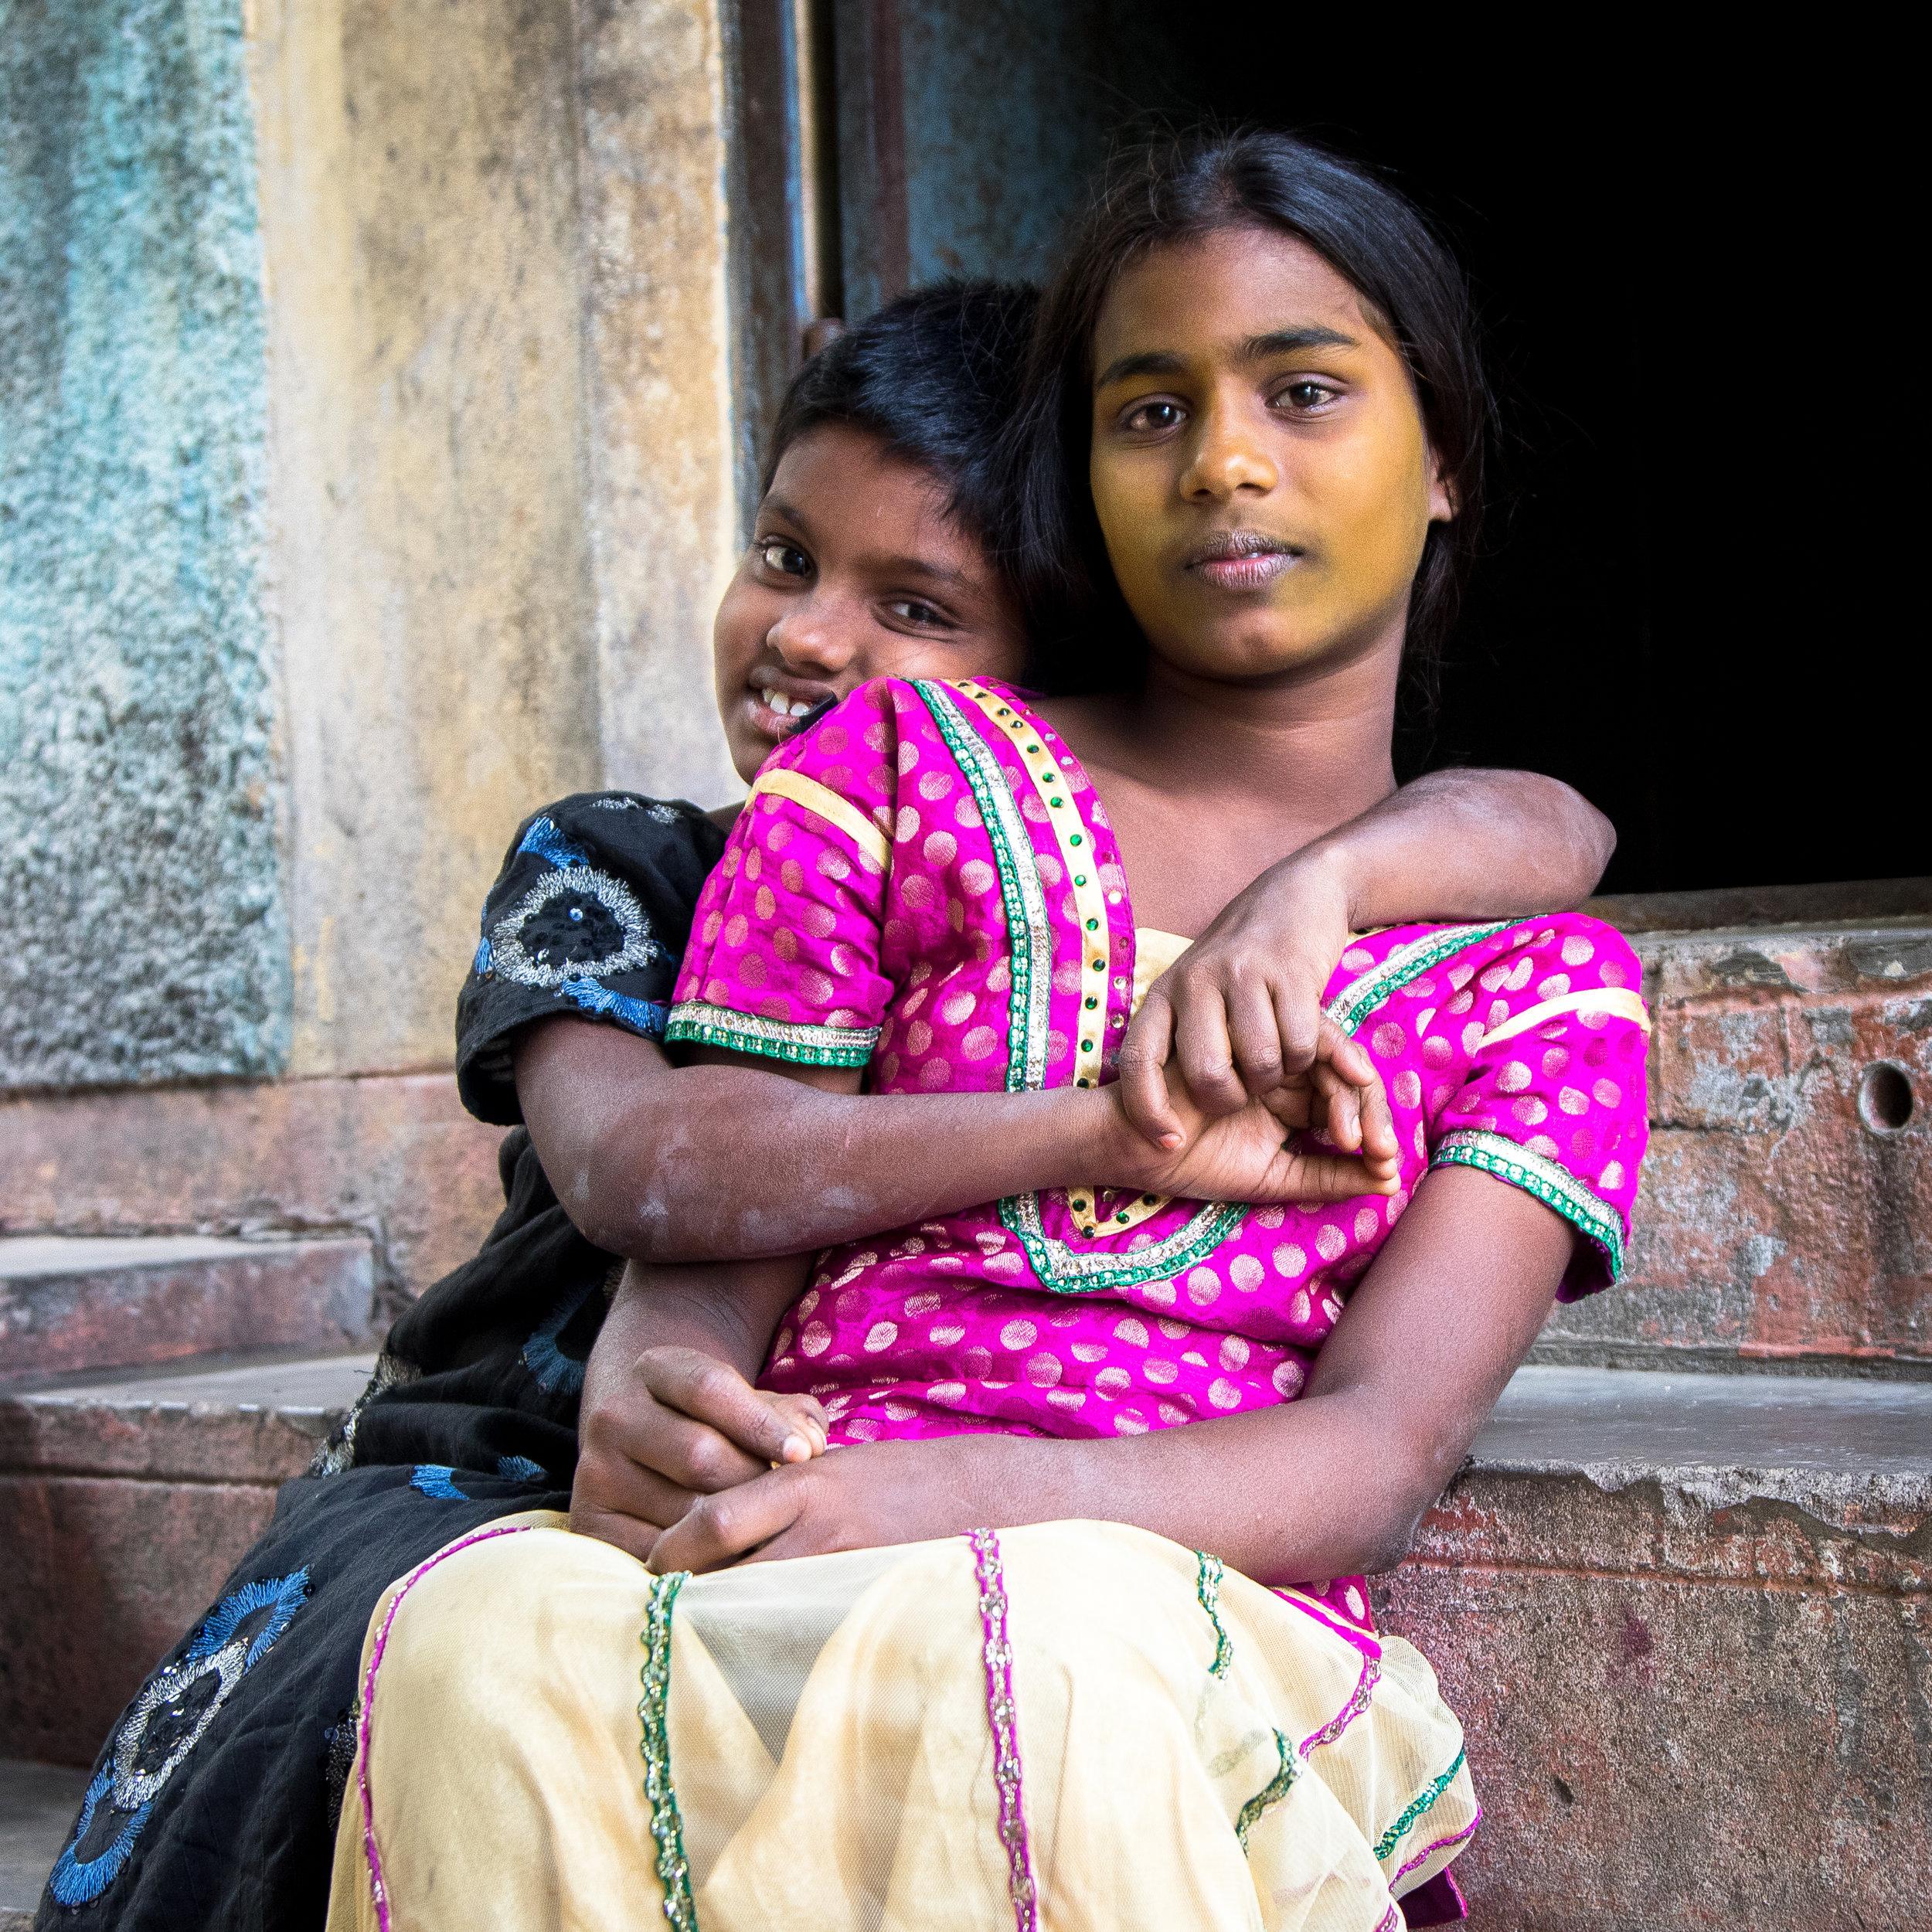 Adam Dickens 2016 - Salt of the Earth, India - 593.jpg